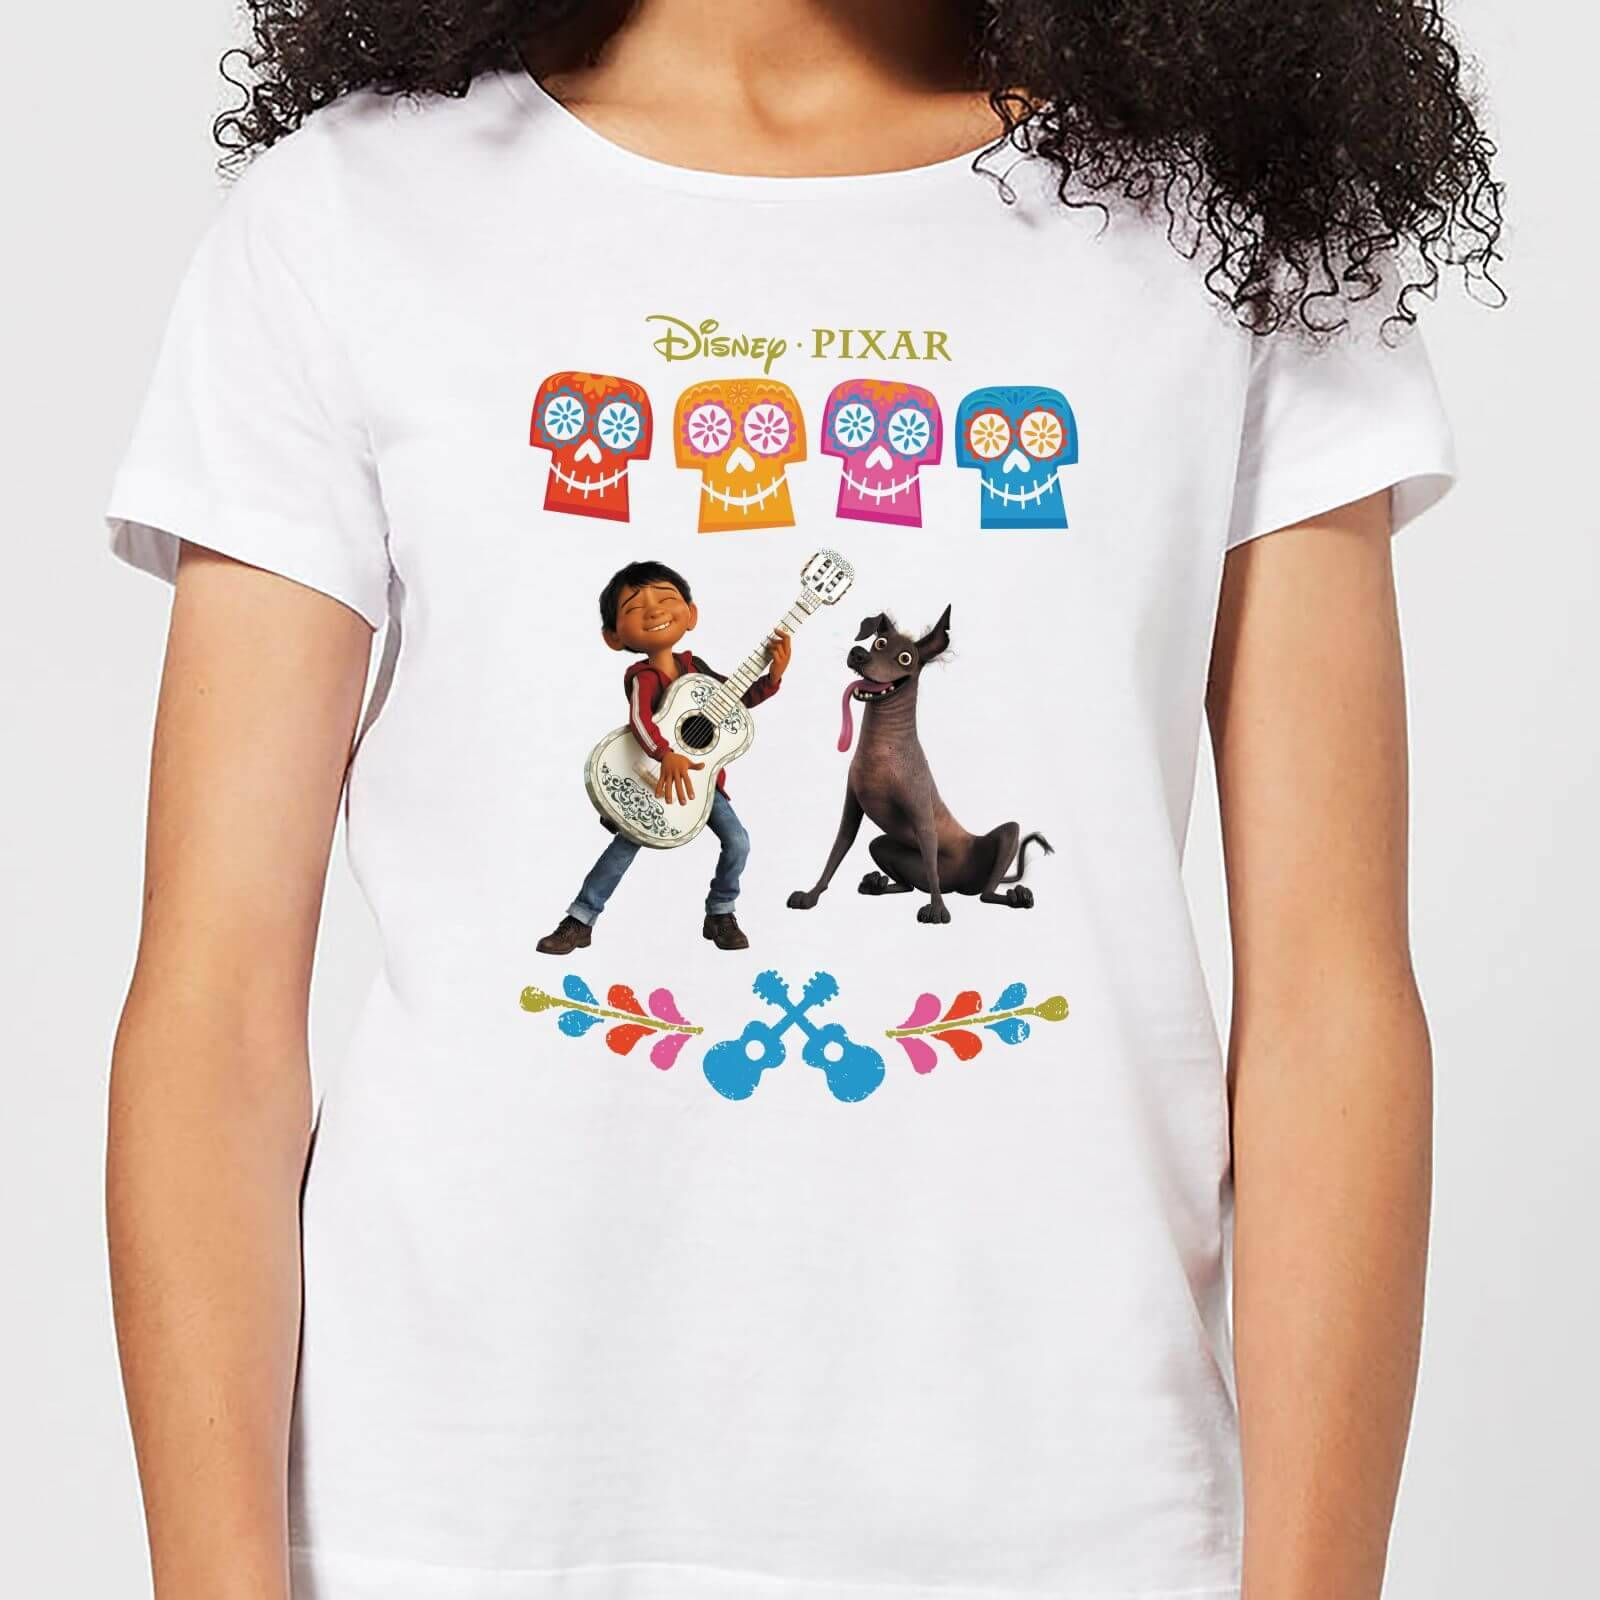 Disney Coco Miguel Logo Women's T-Shirt - White - 5XL - White